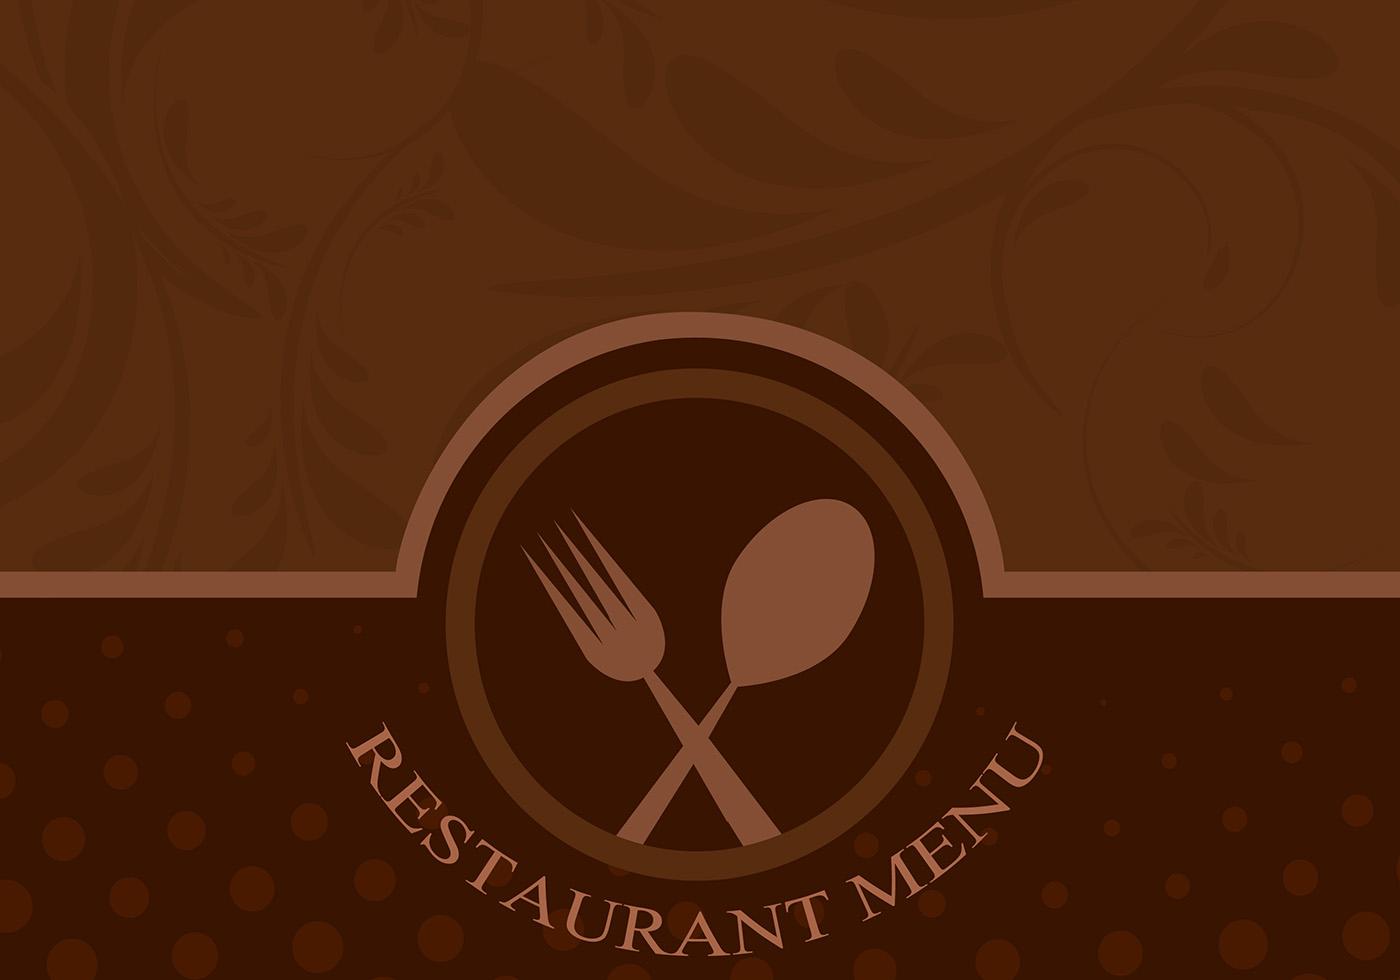 restaurant menu background free vector art - (56360 free downloads)